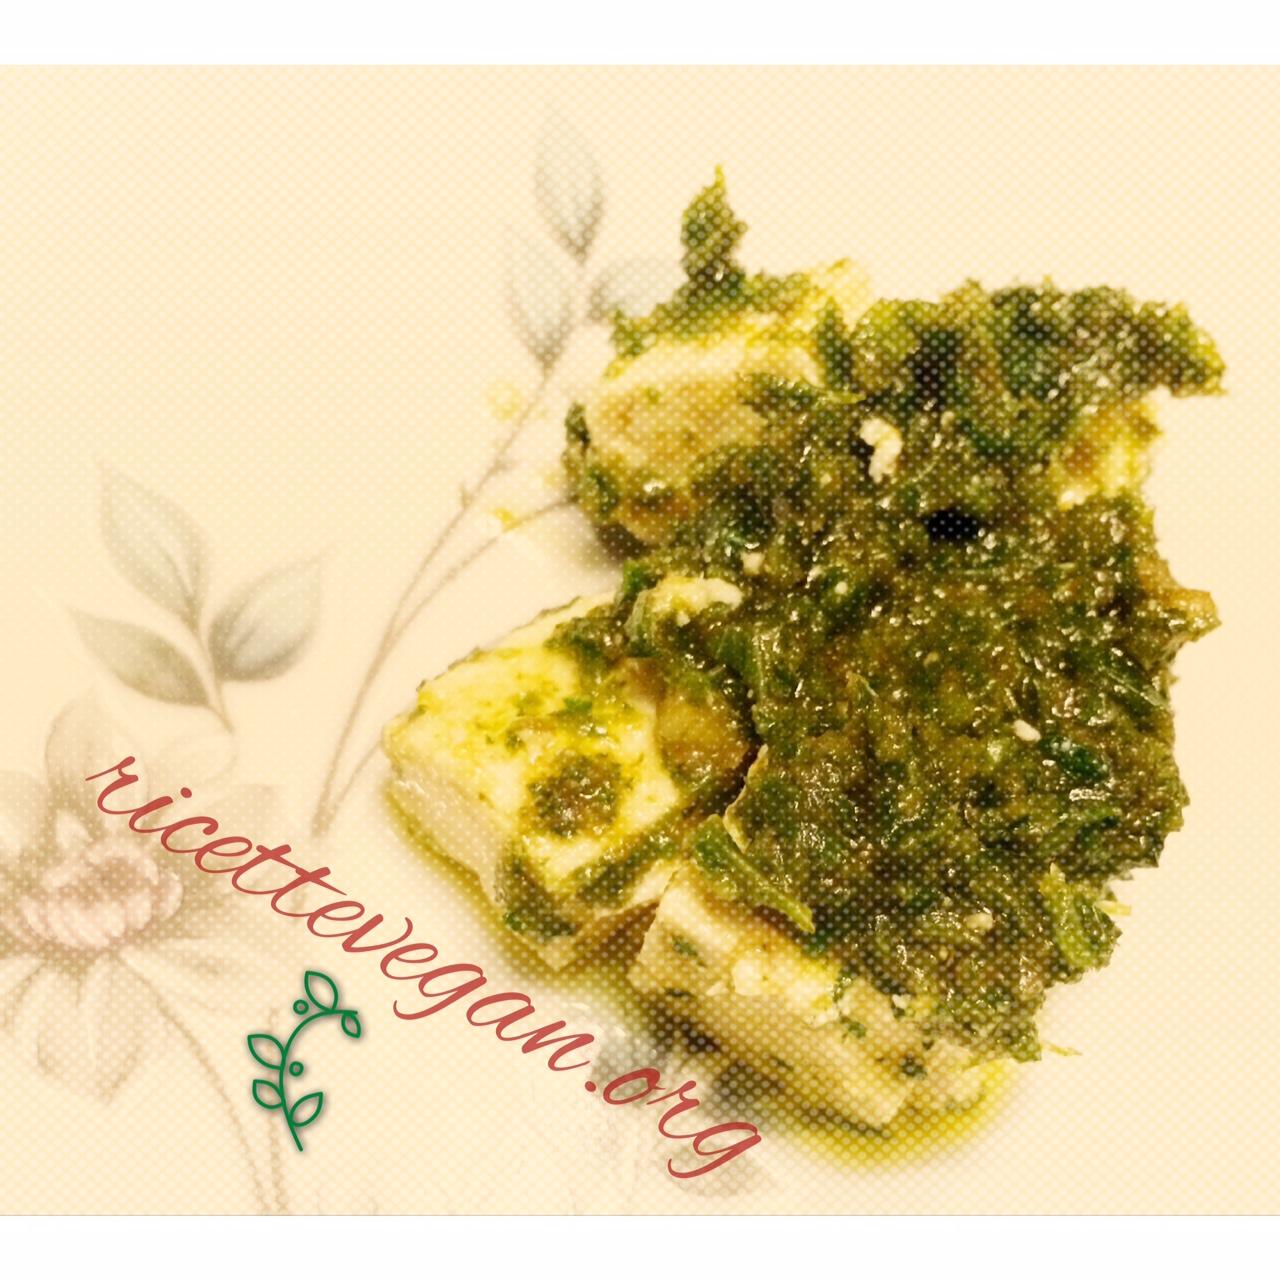 Tofumini al Verde